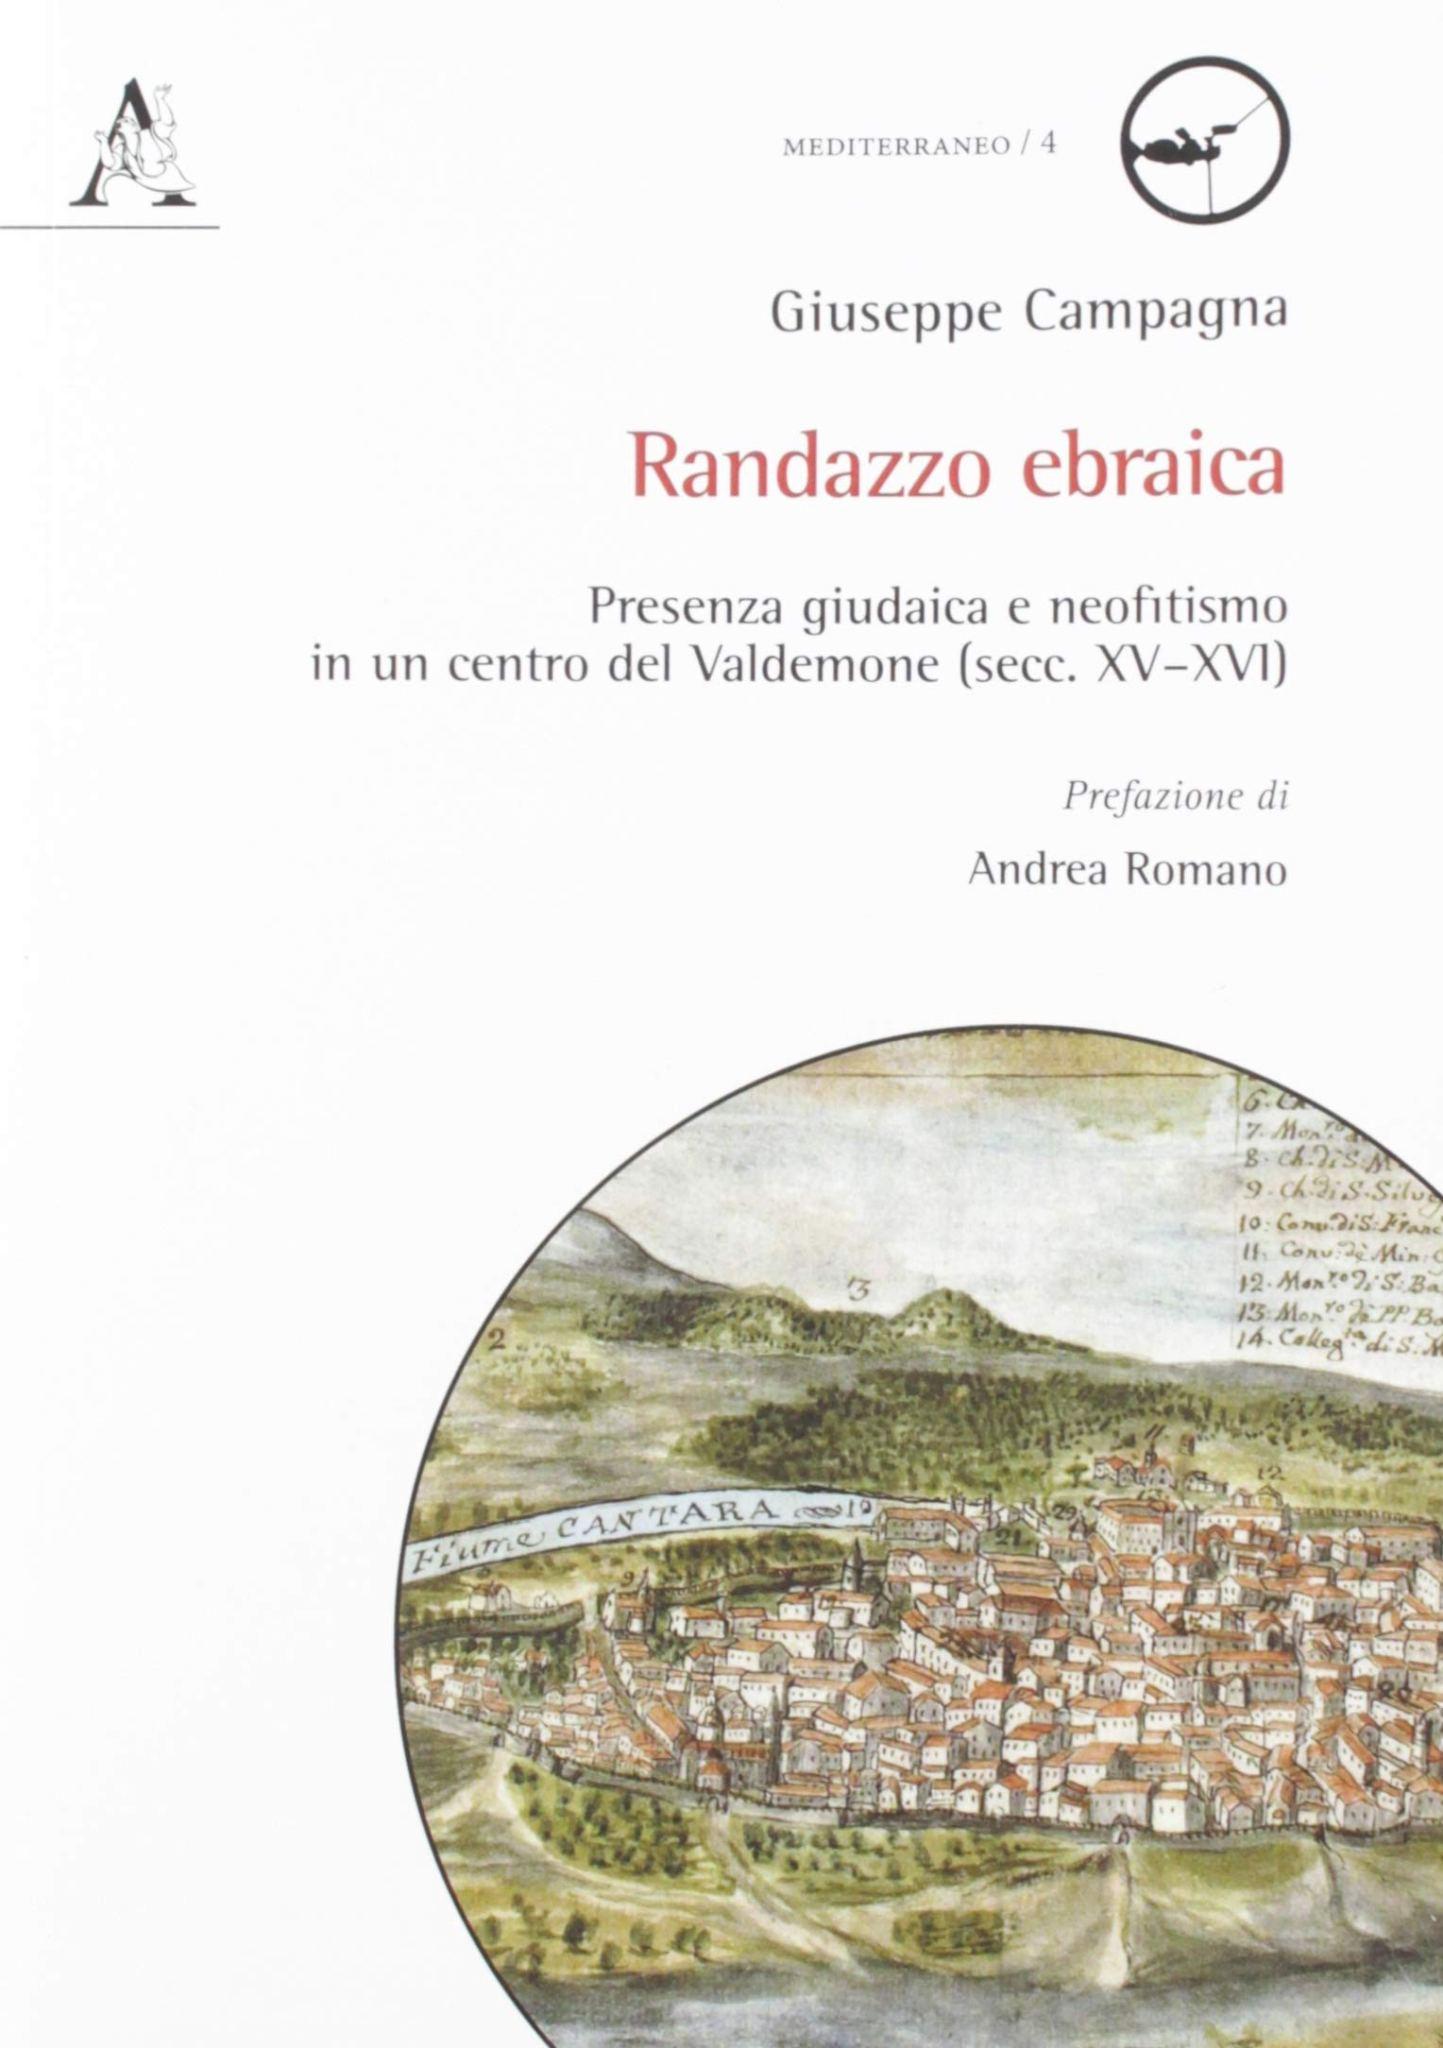 Randazzo Ebraica - Giuseppe Campagna